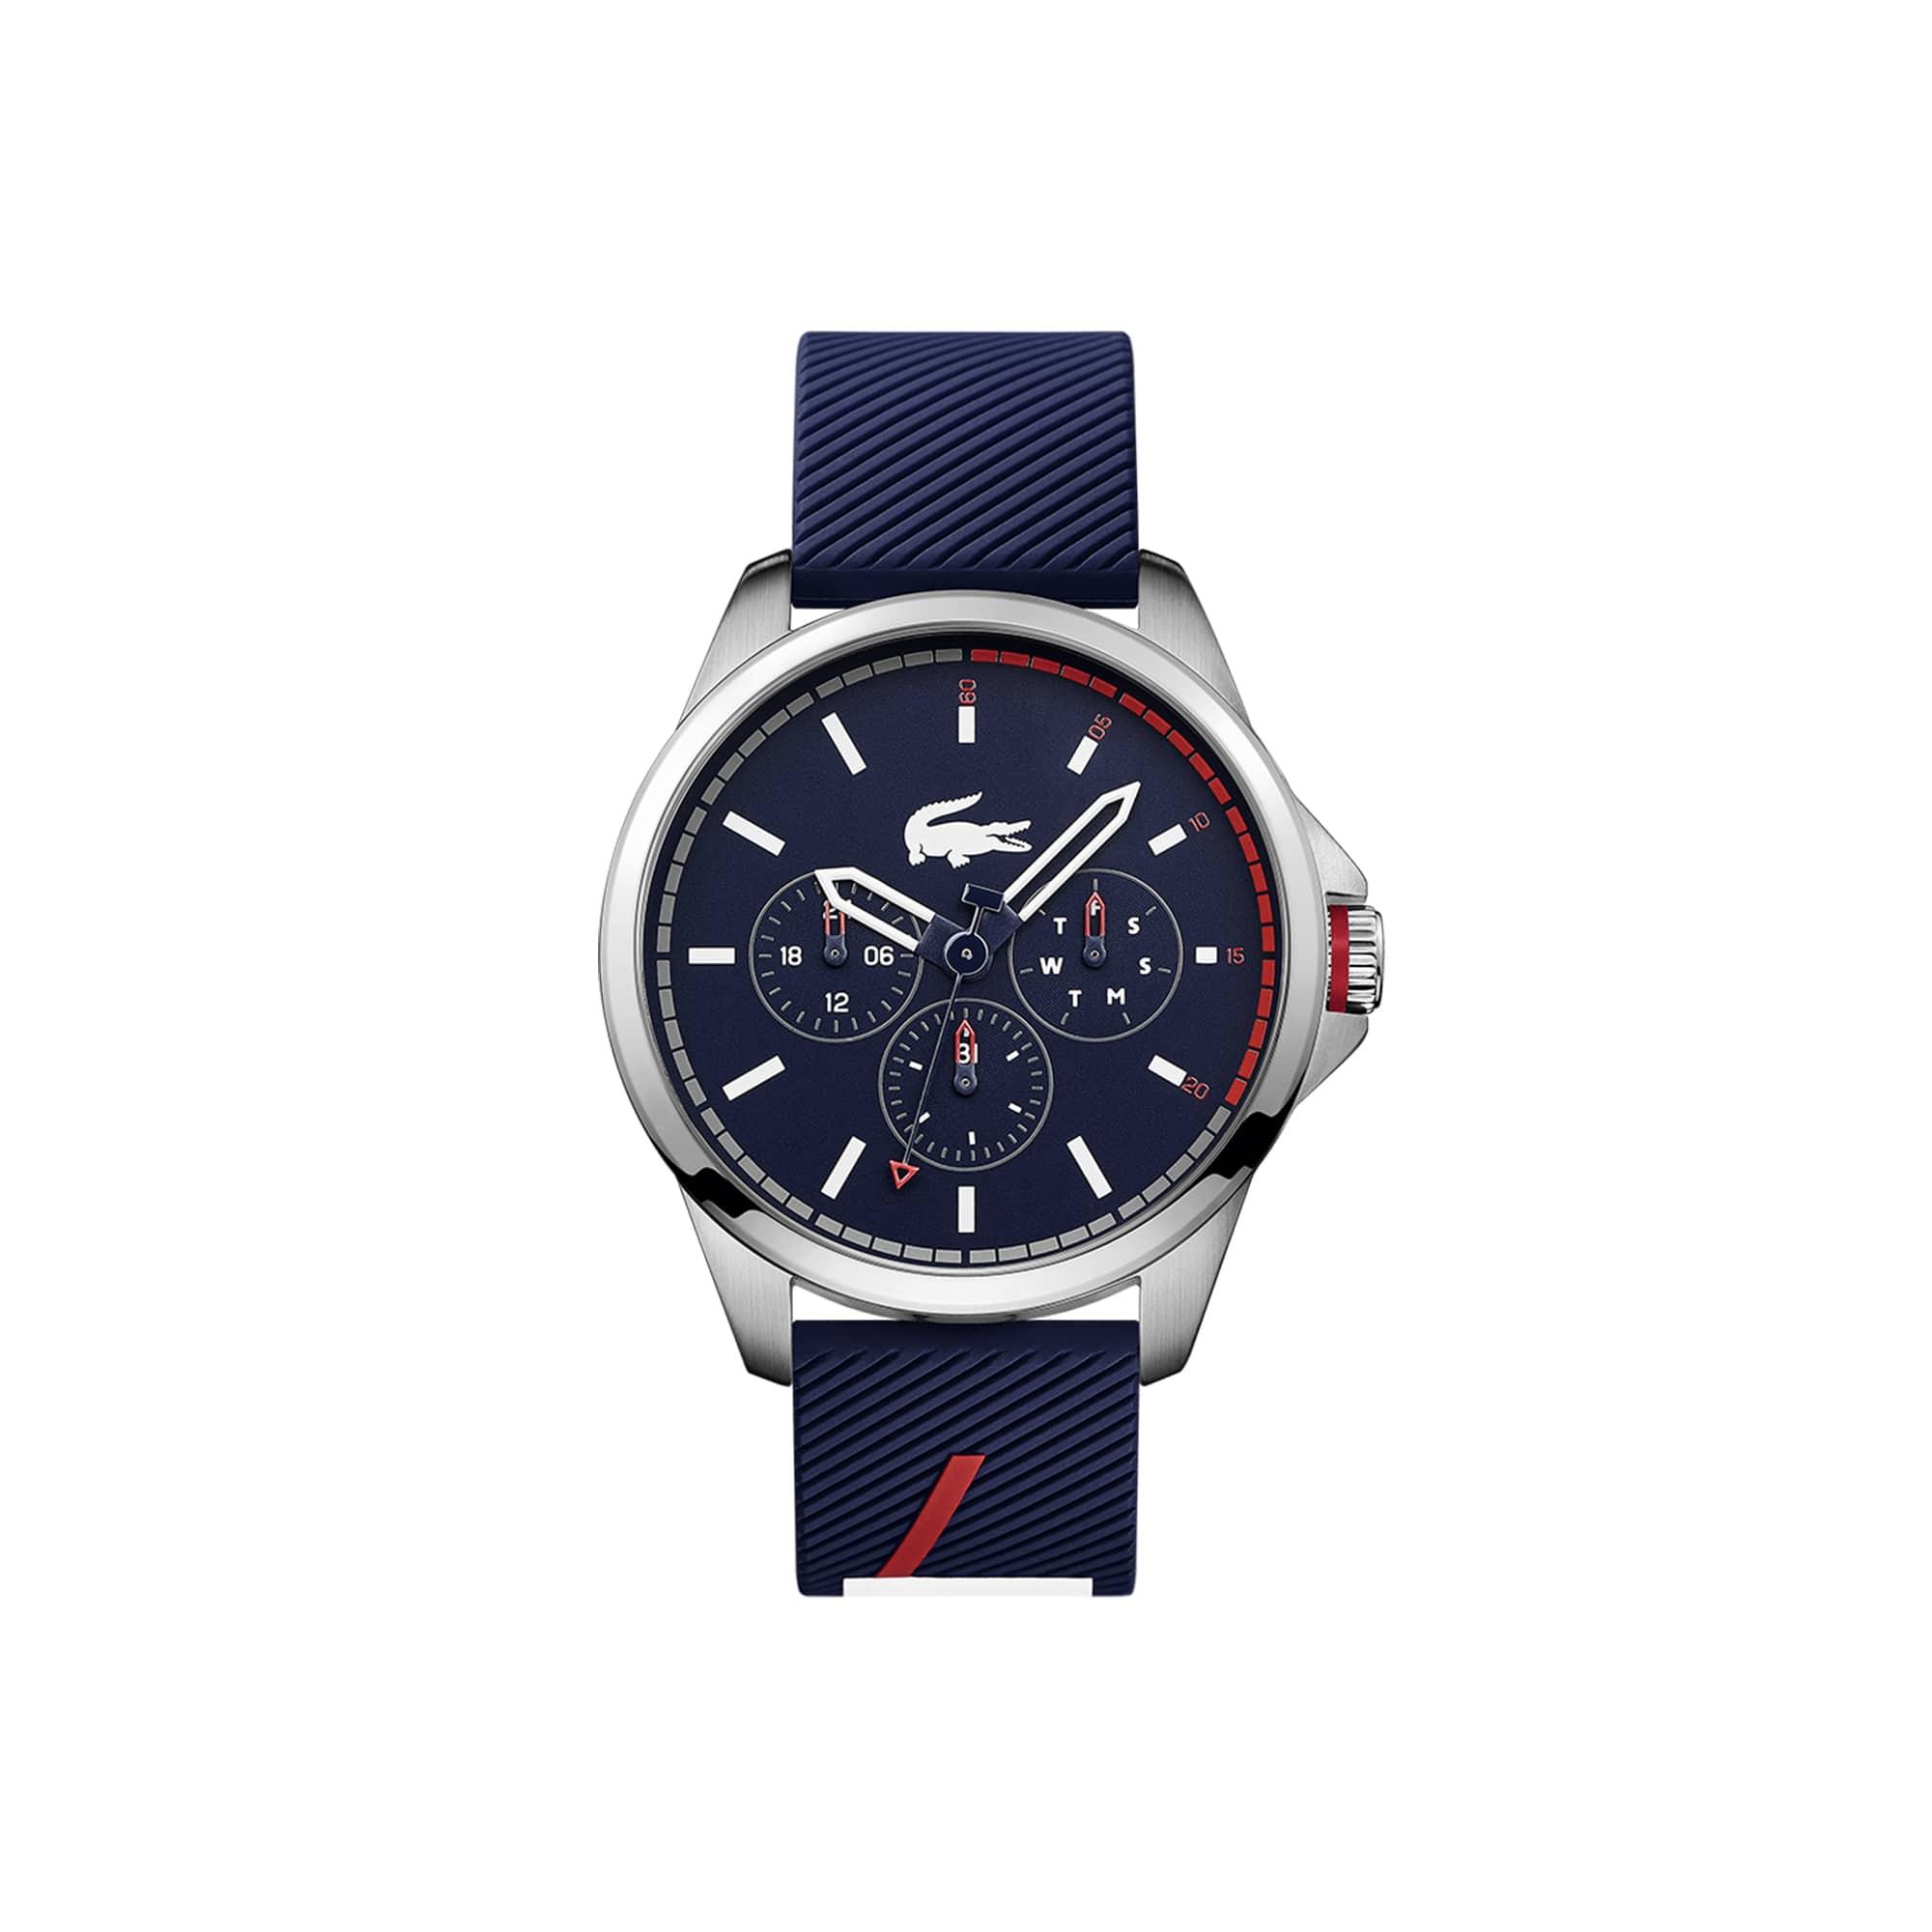 8f0ffd498cc5 Reloj de Hombre Capbreton Multifunción con Correa de Silicona Azul